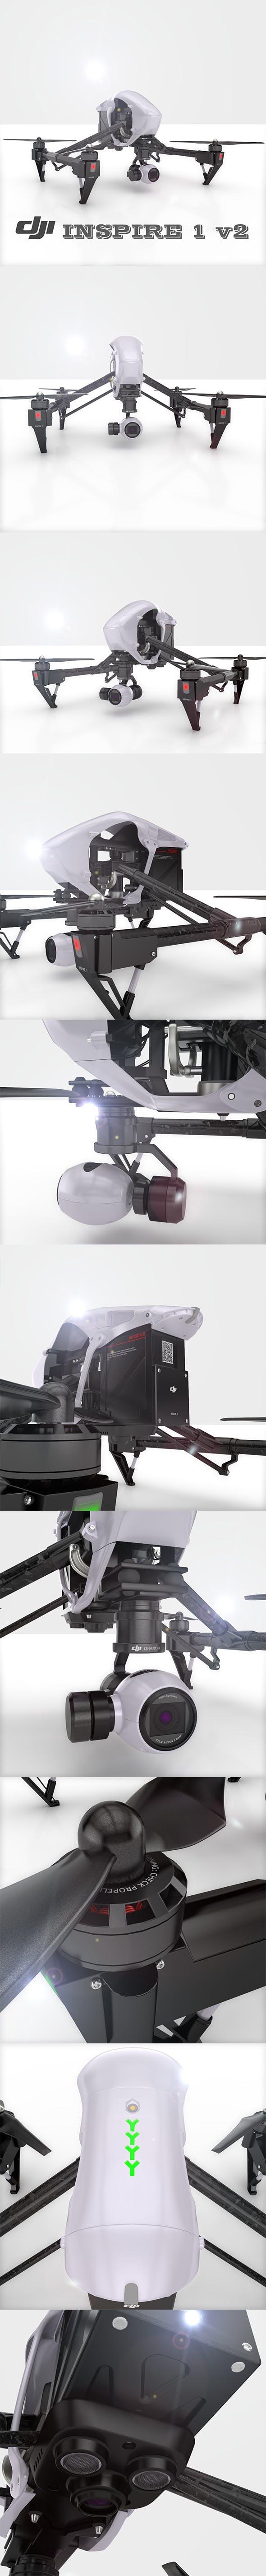 DJI Inspire1 Drone - 3DOcean Item for Sale